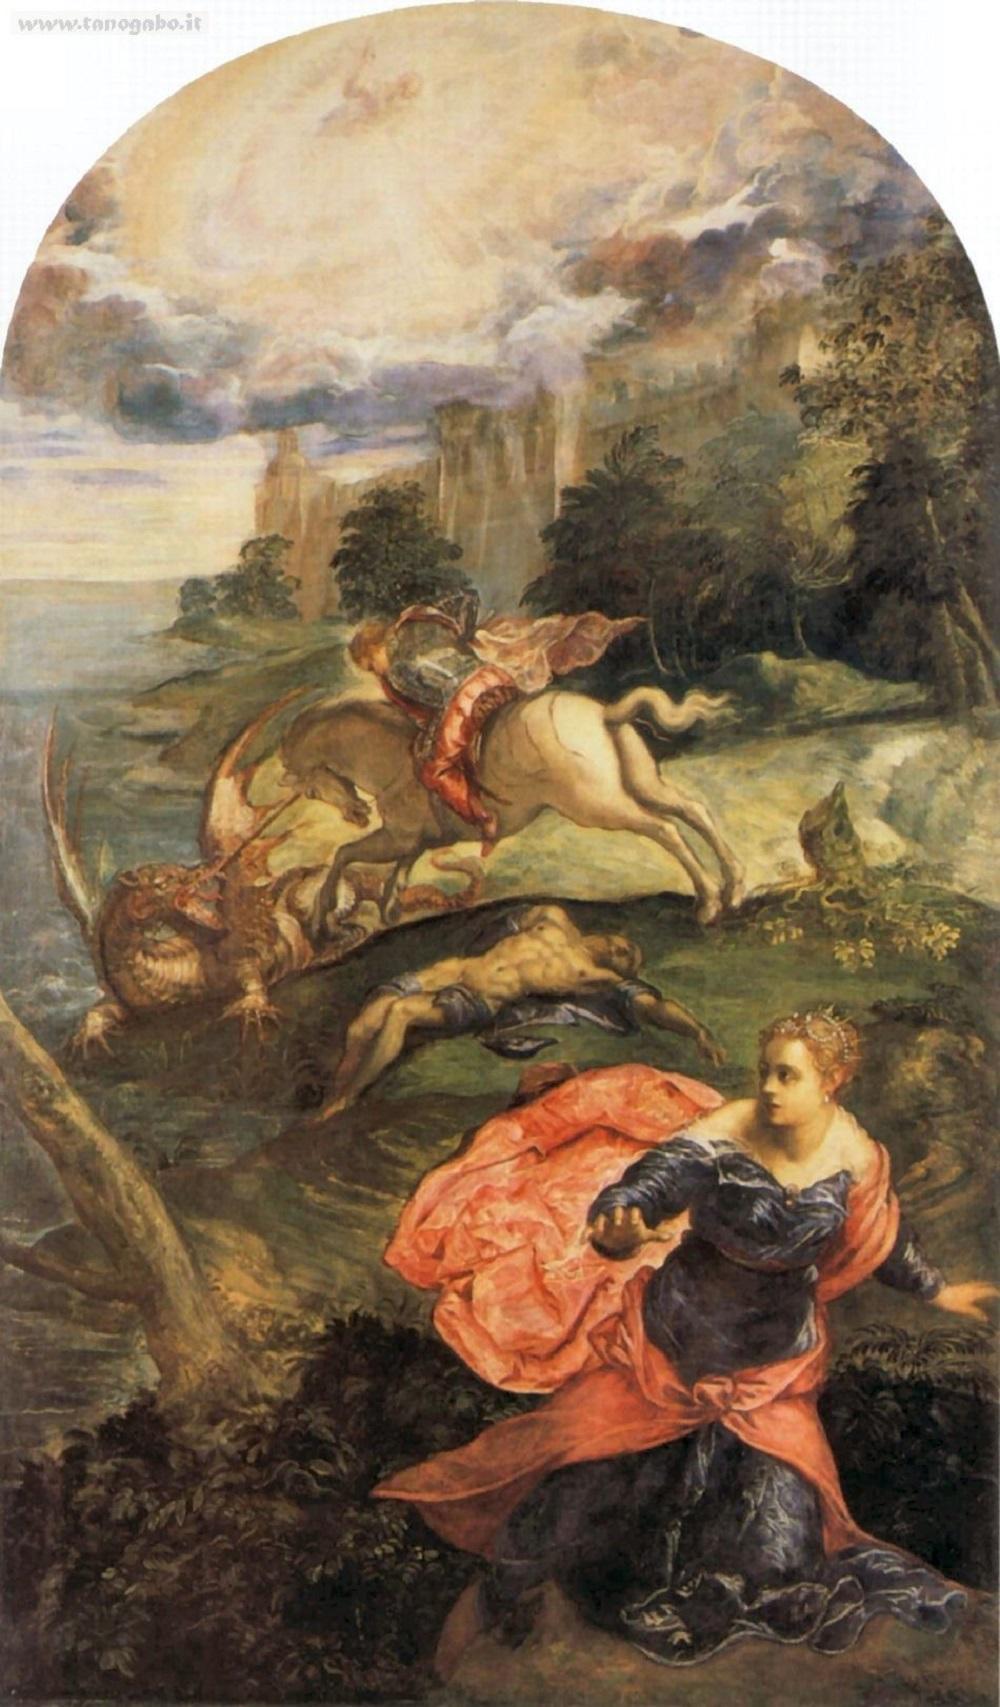 Tintoretto's St. George and the Dragon 1555-1558. Национальная галерея, Лондон.